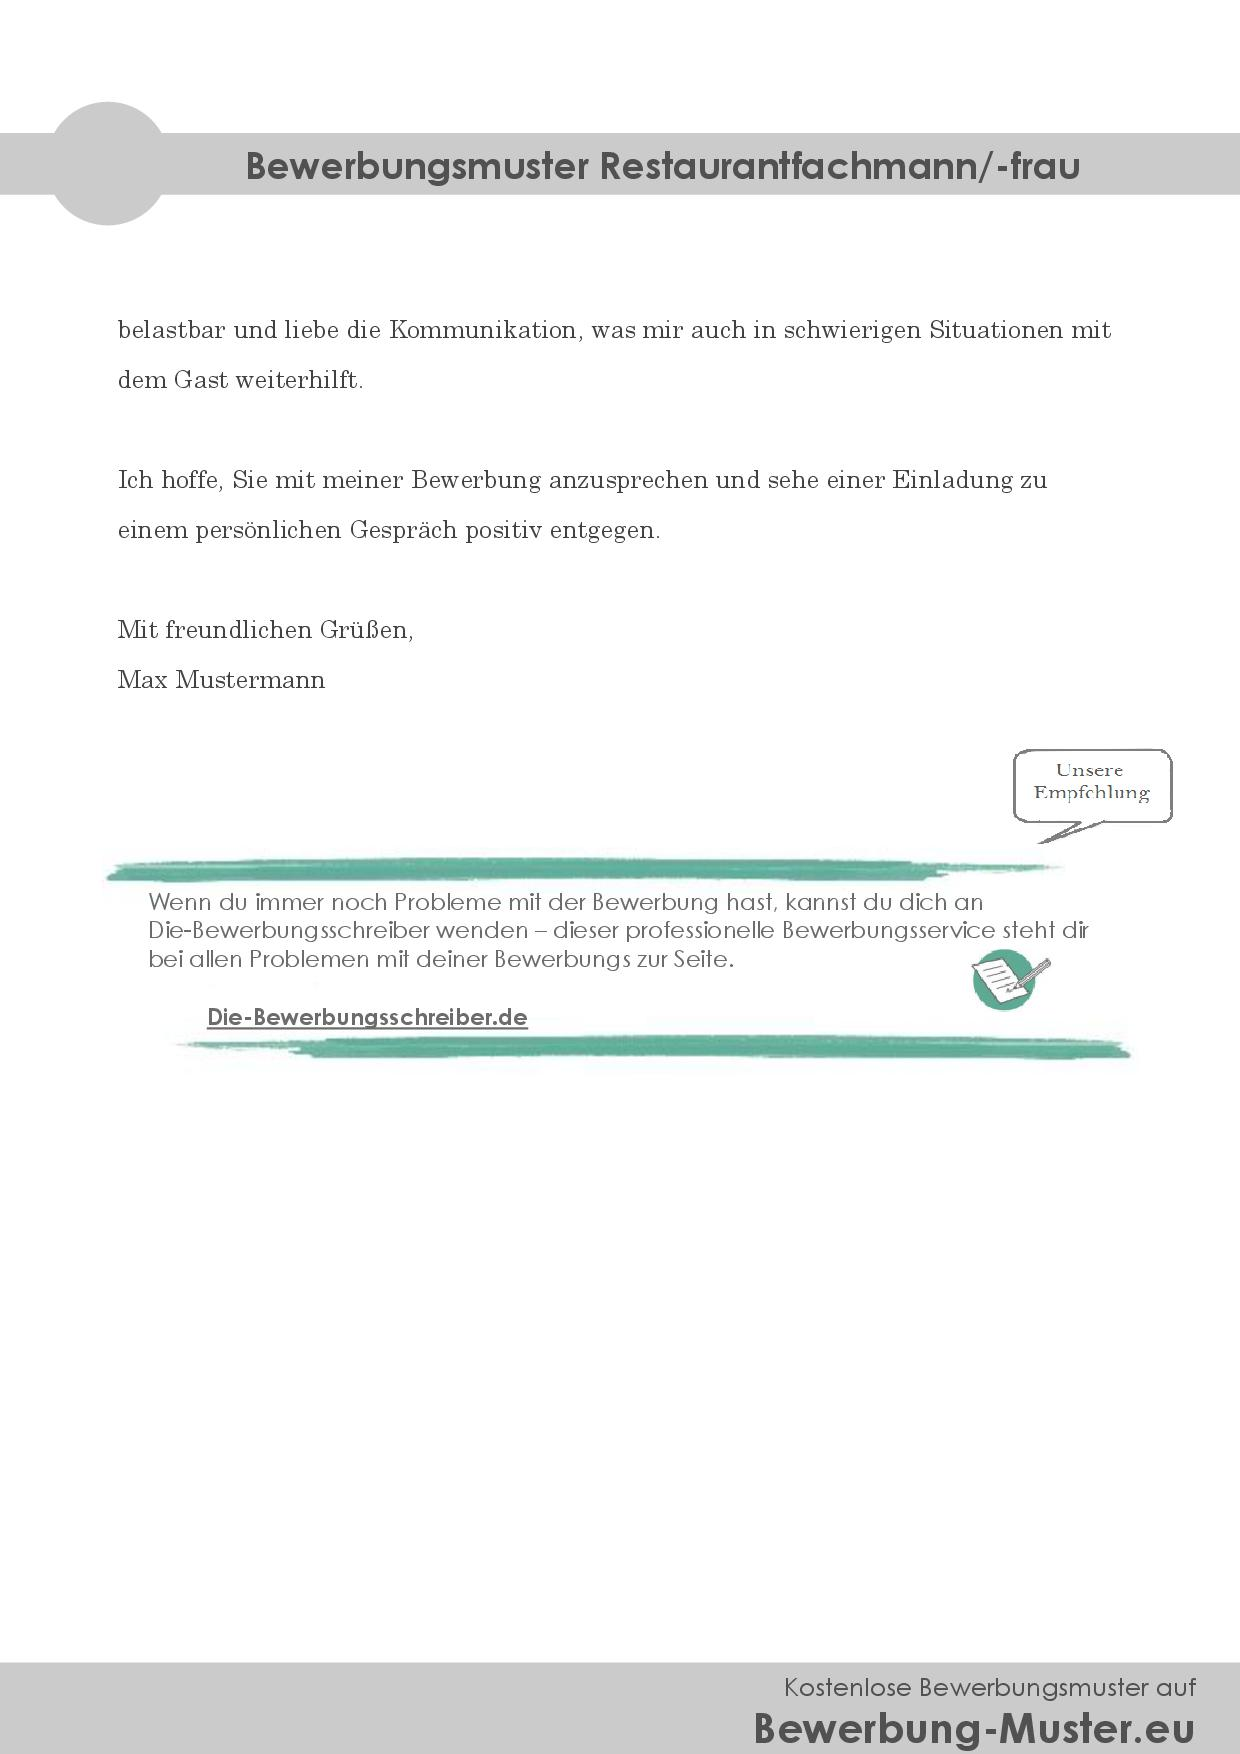 Bewerbungsmuster Restaurantfachmann/-frau